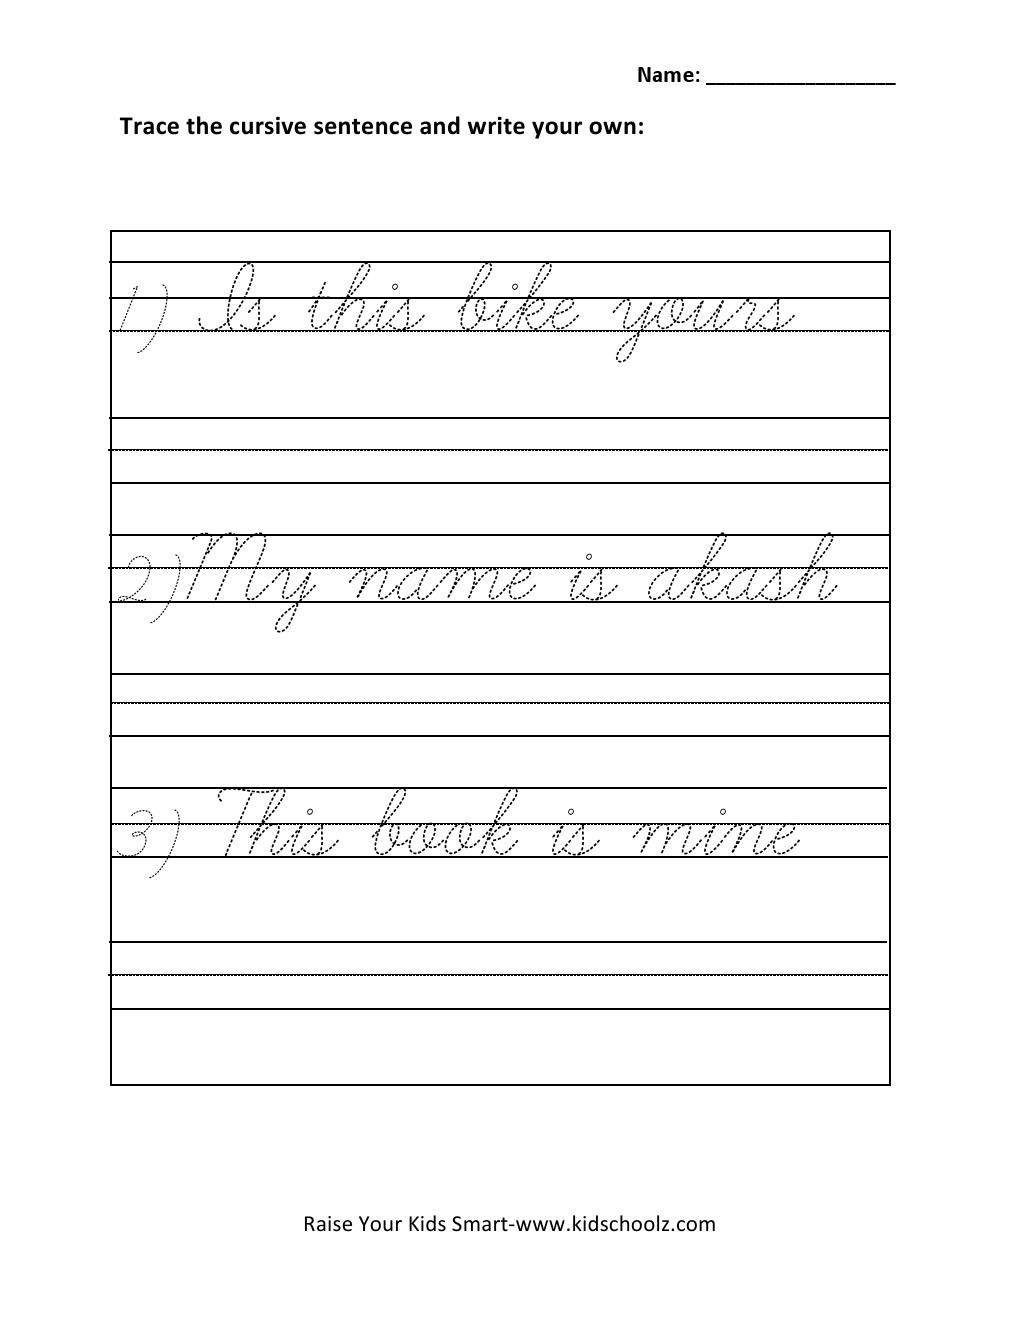 hight resolution of Grade 1 - Cursive Writing Sentences Worksheet 4 - Kidschoolz